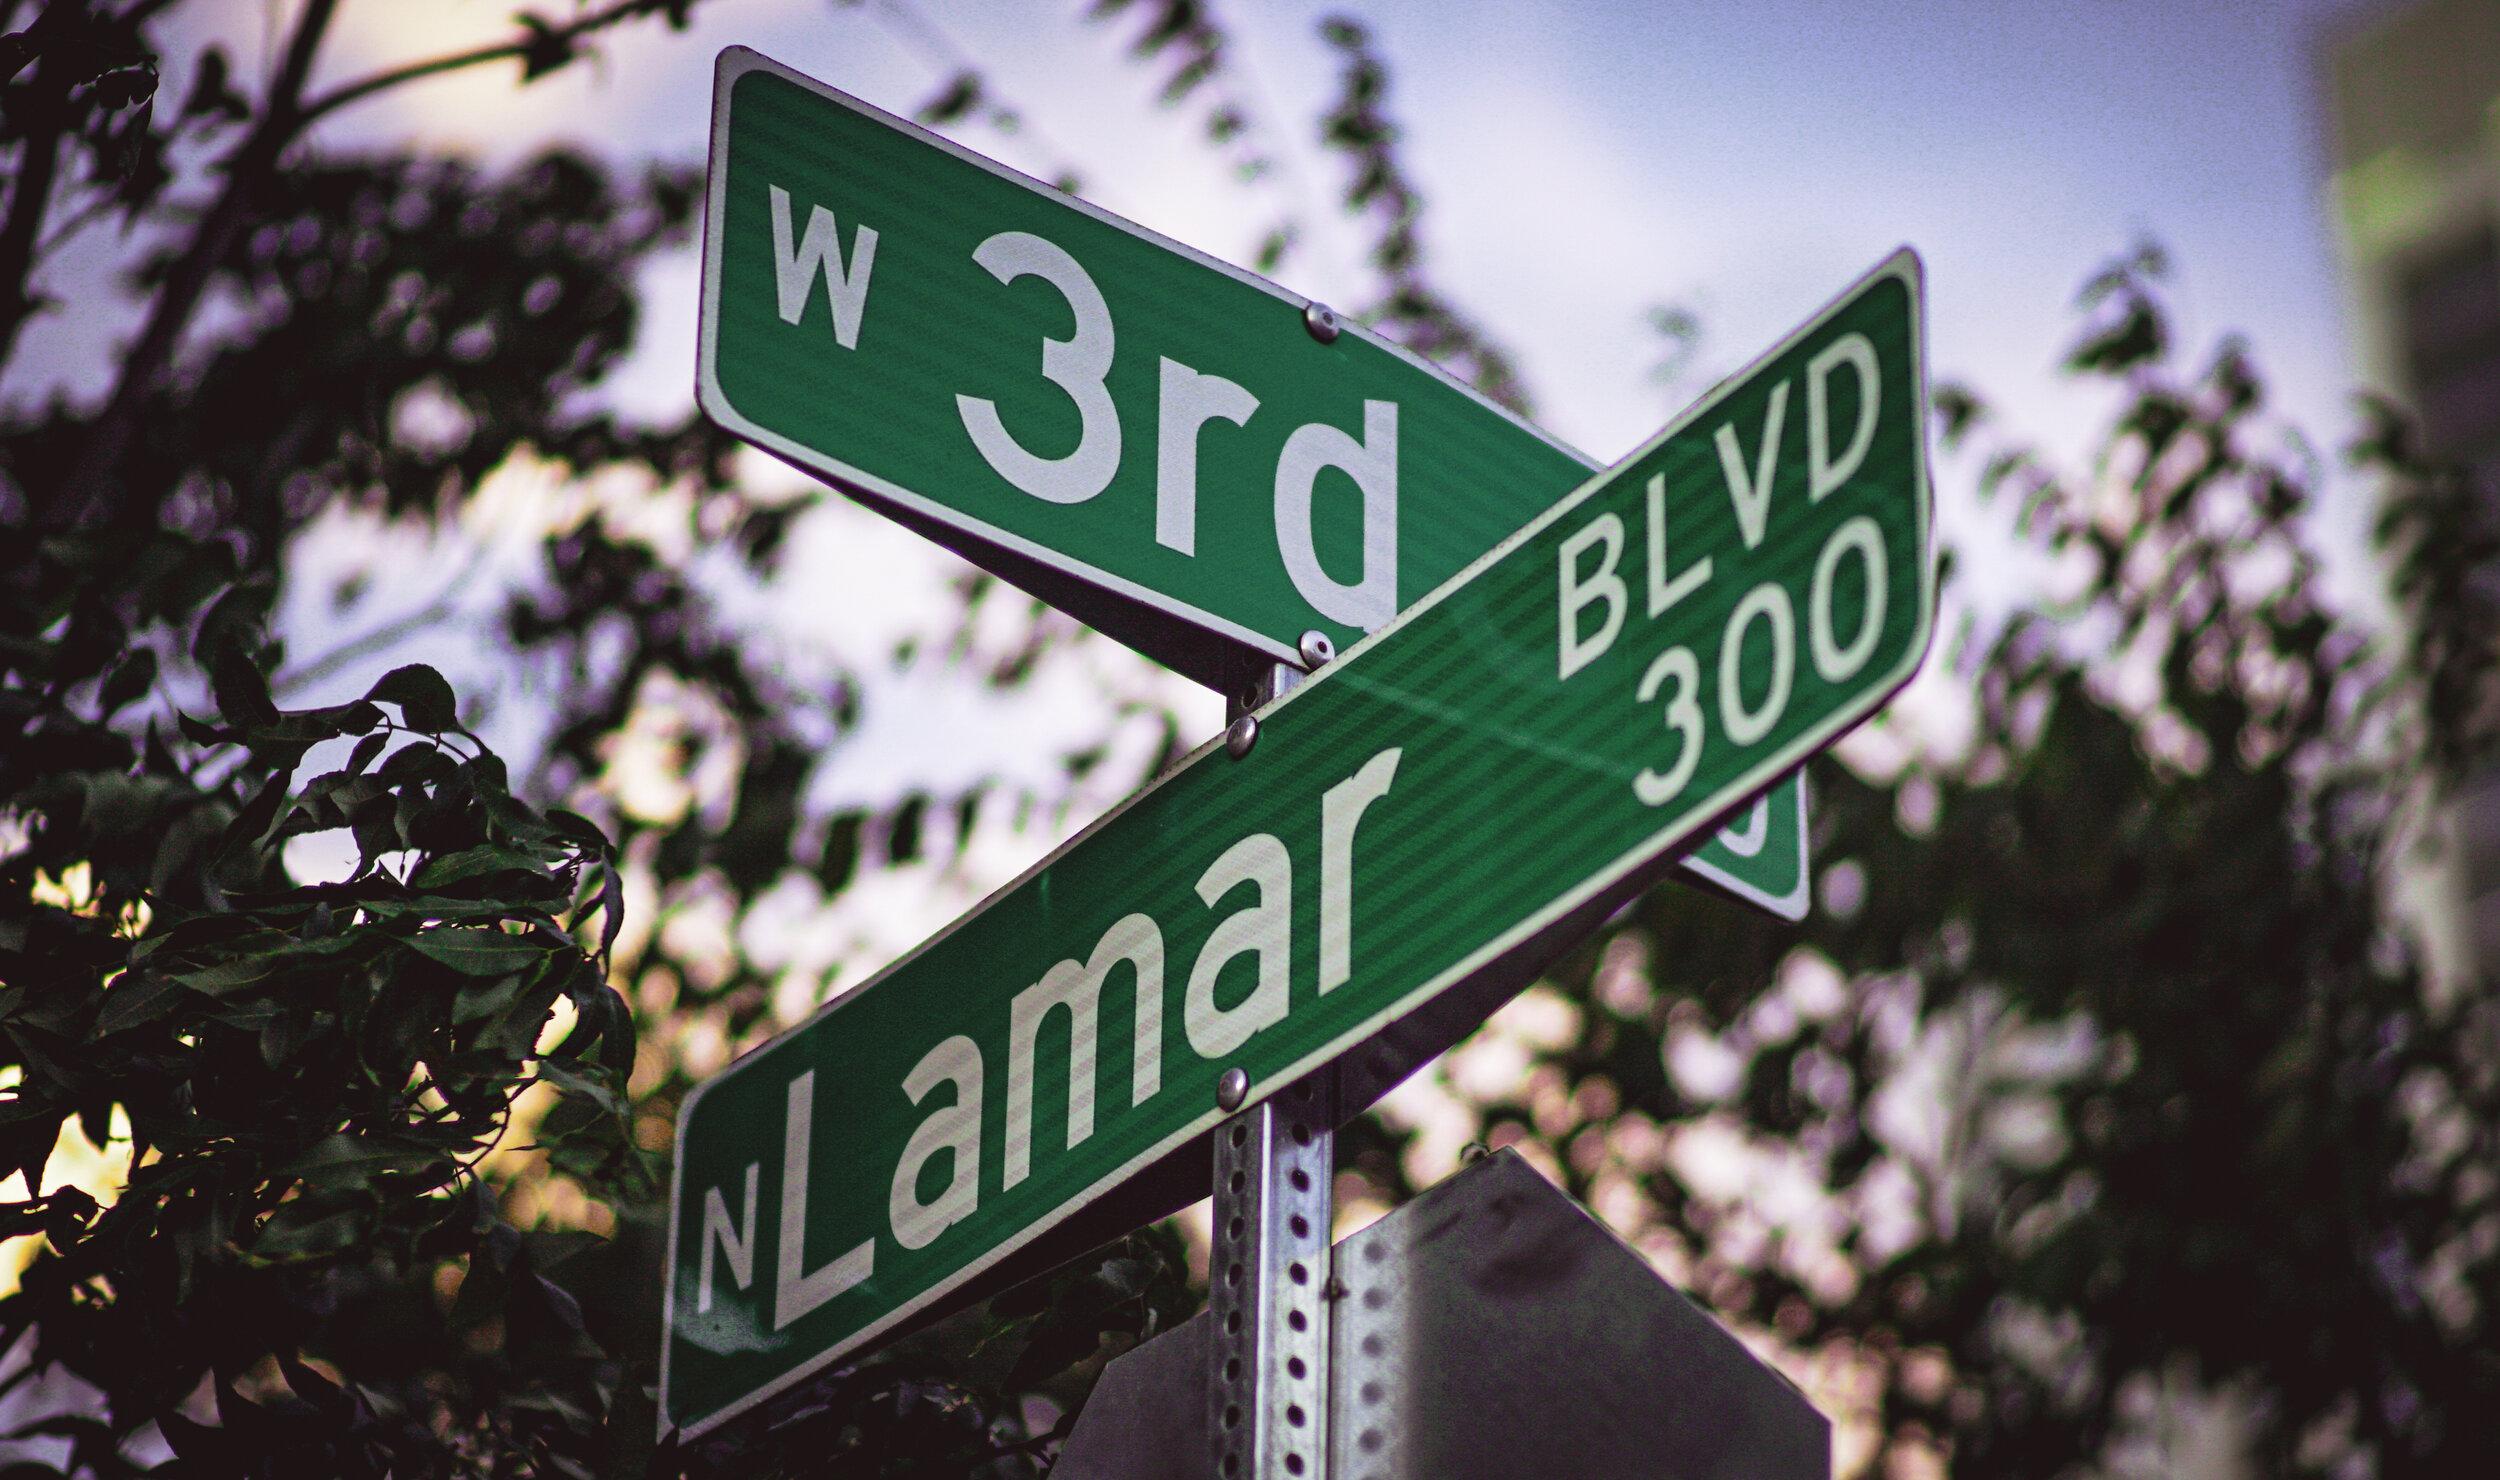 3rd & Lamar sign.jpg